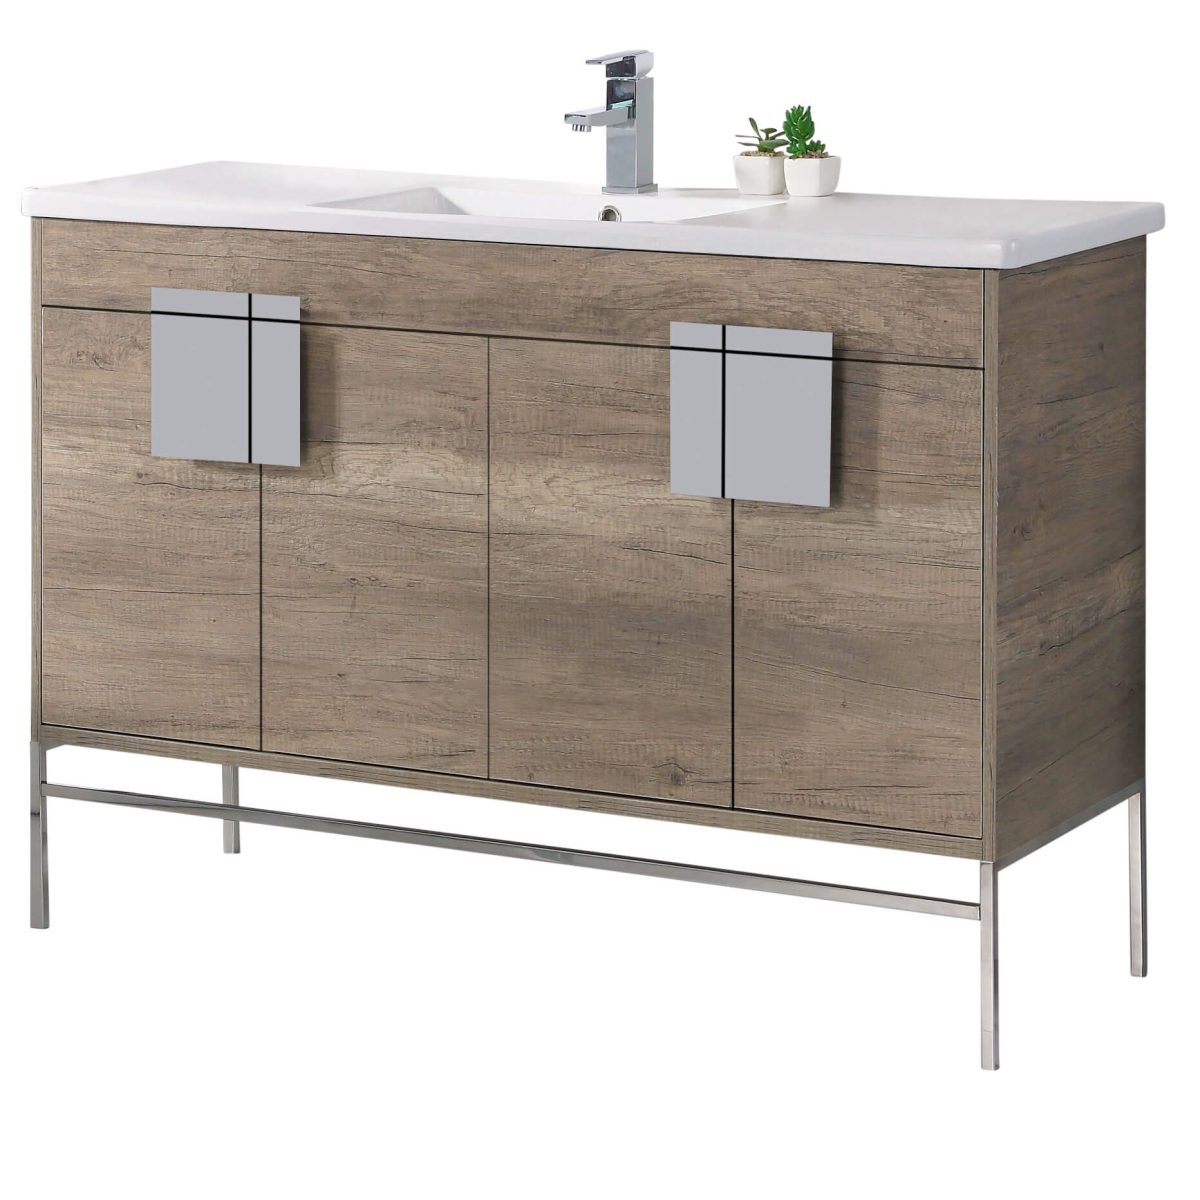 "Shawbridge 48"" Modern Single Bathroom Vanity  Shadow Gray with Polished Chrome Hardware"